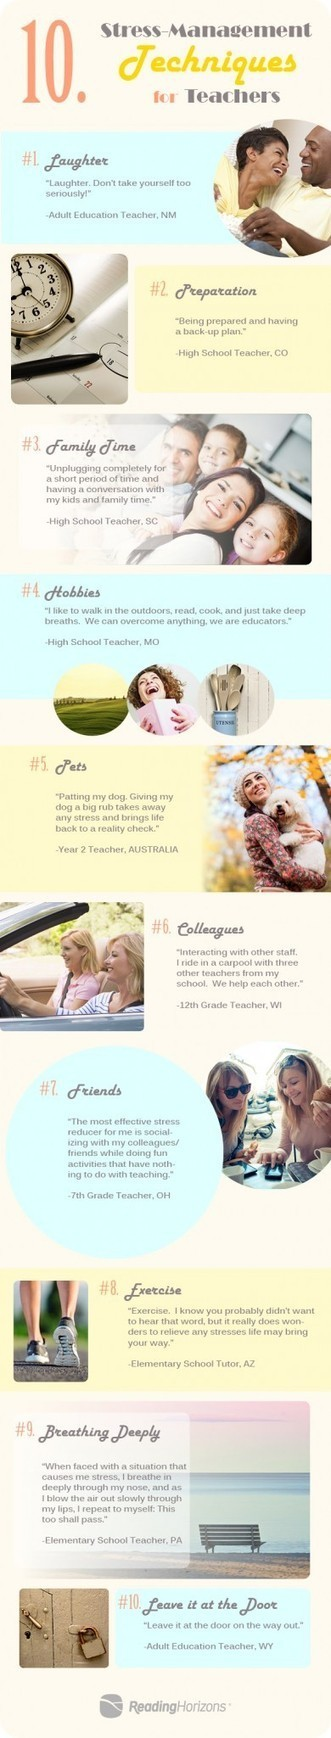 10 Stress-Management Techniques for Teachers Infographic | EFL ideas | Scoop.it